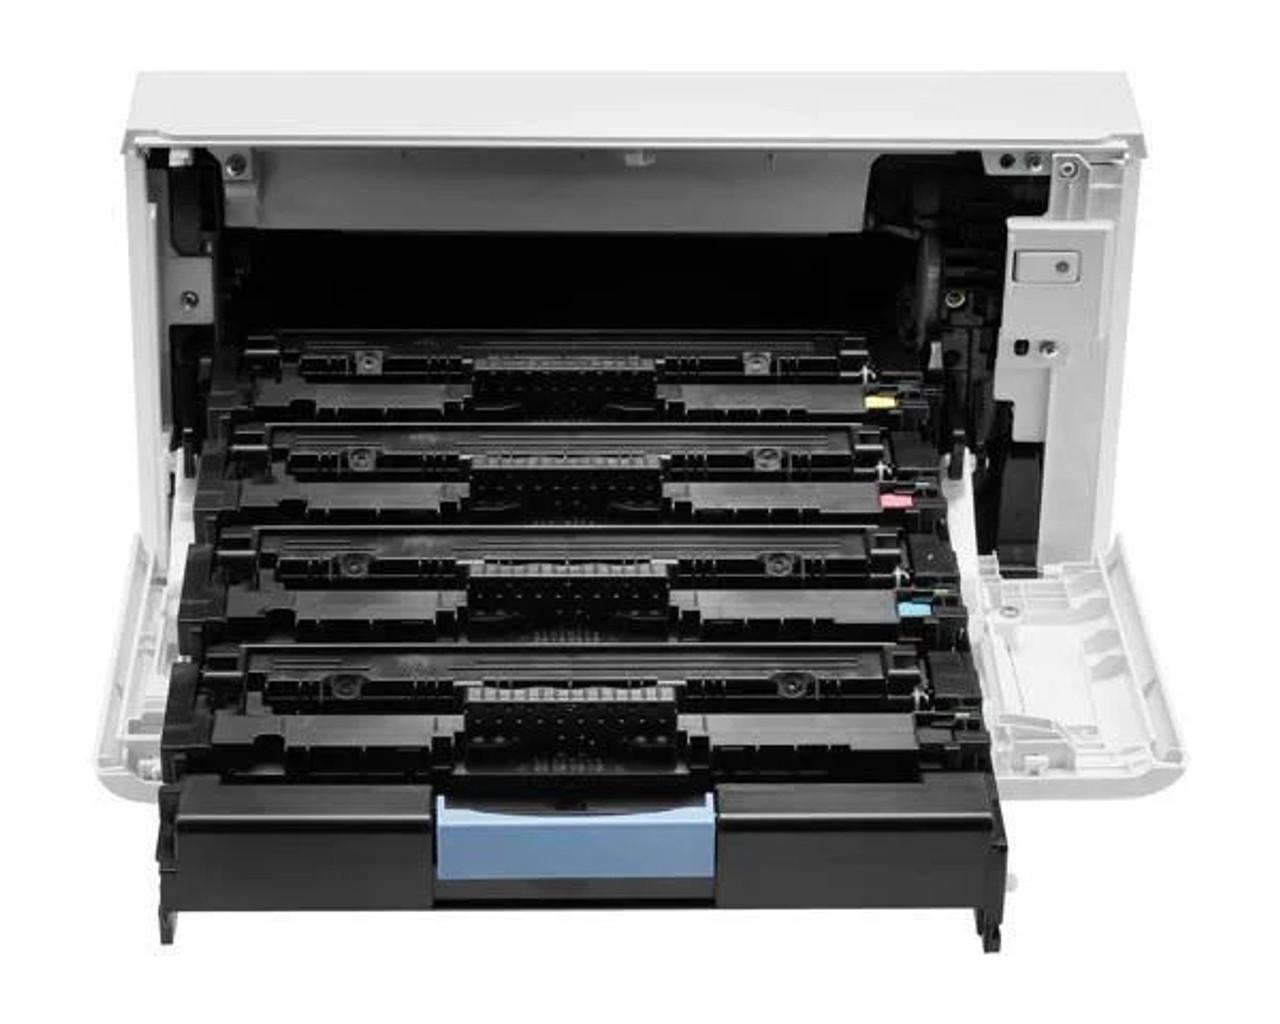 HP Color LaserJet Pro M454dw Laser Printer - W1Y45A